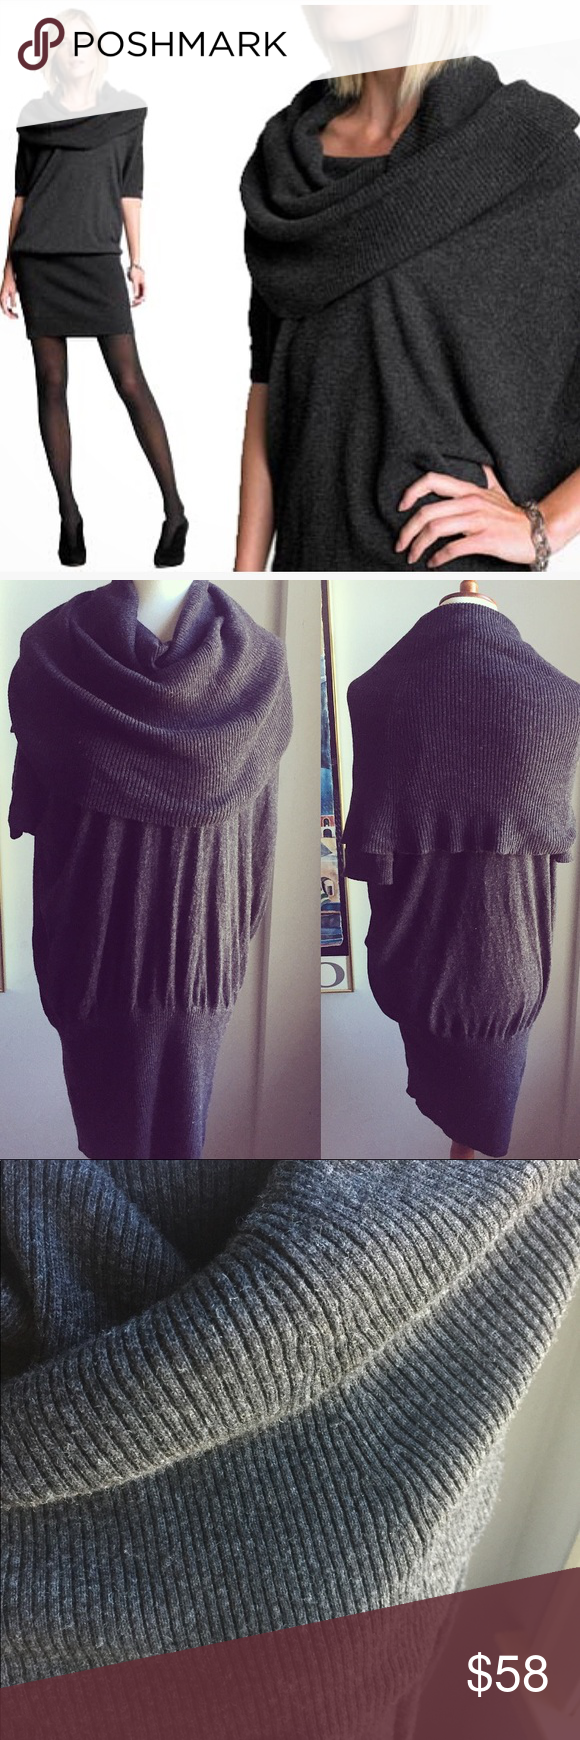 18++ Cashmere sweater dress banana republic ideas